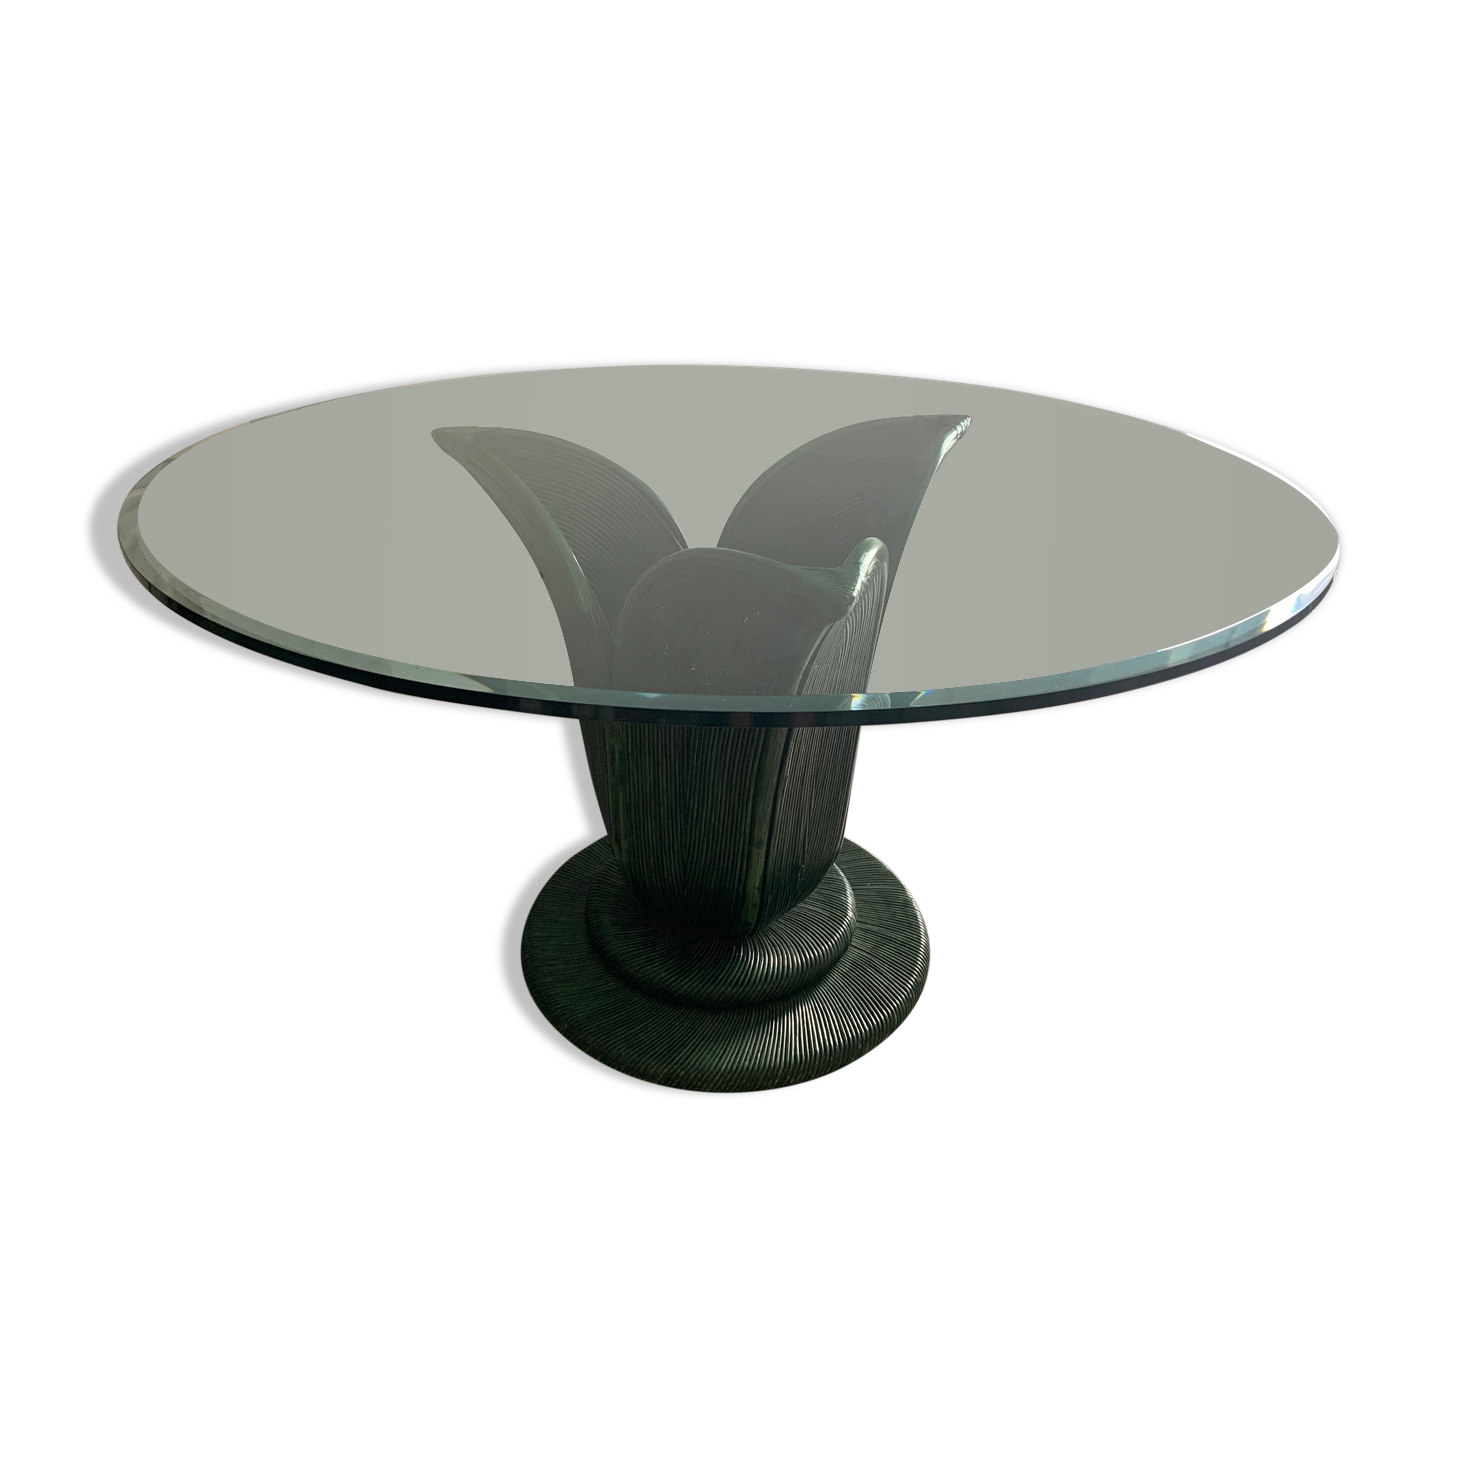 Table salle à manger Roche Bobois